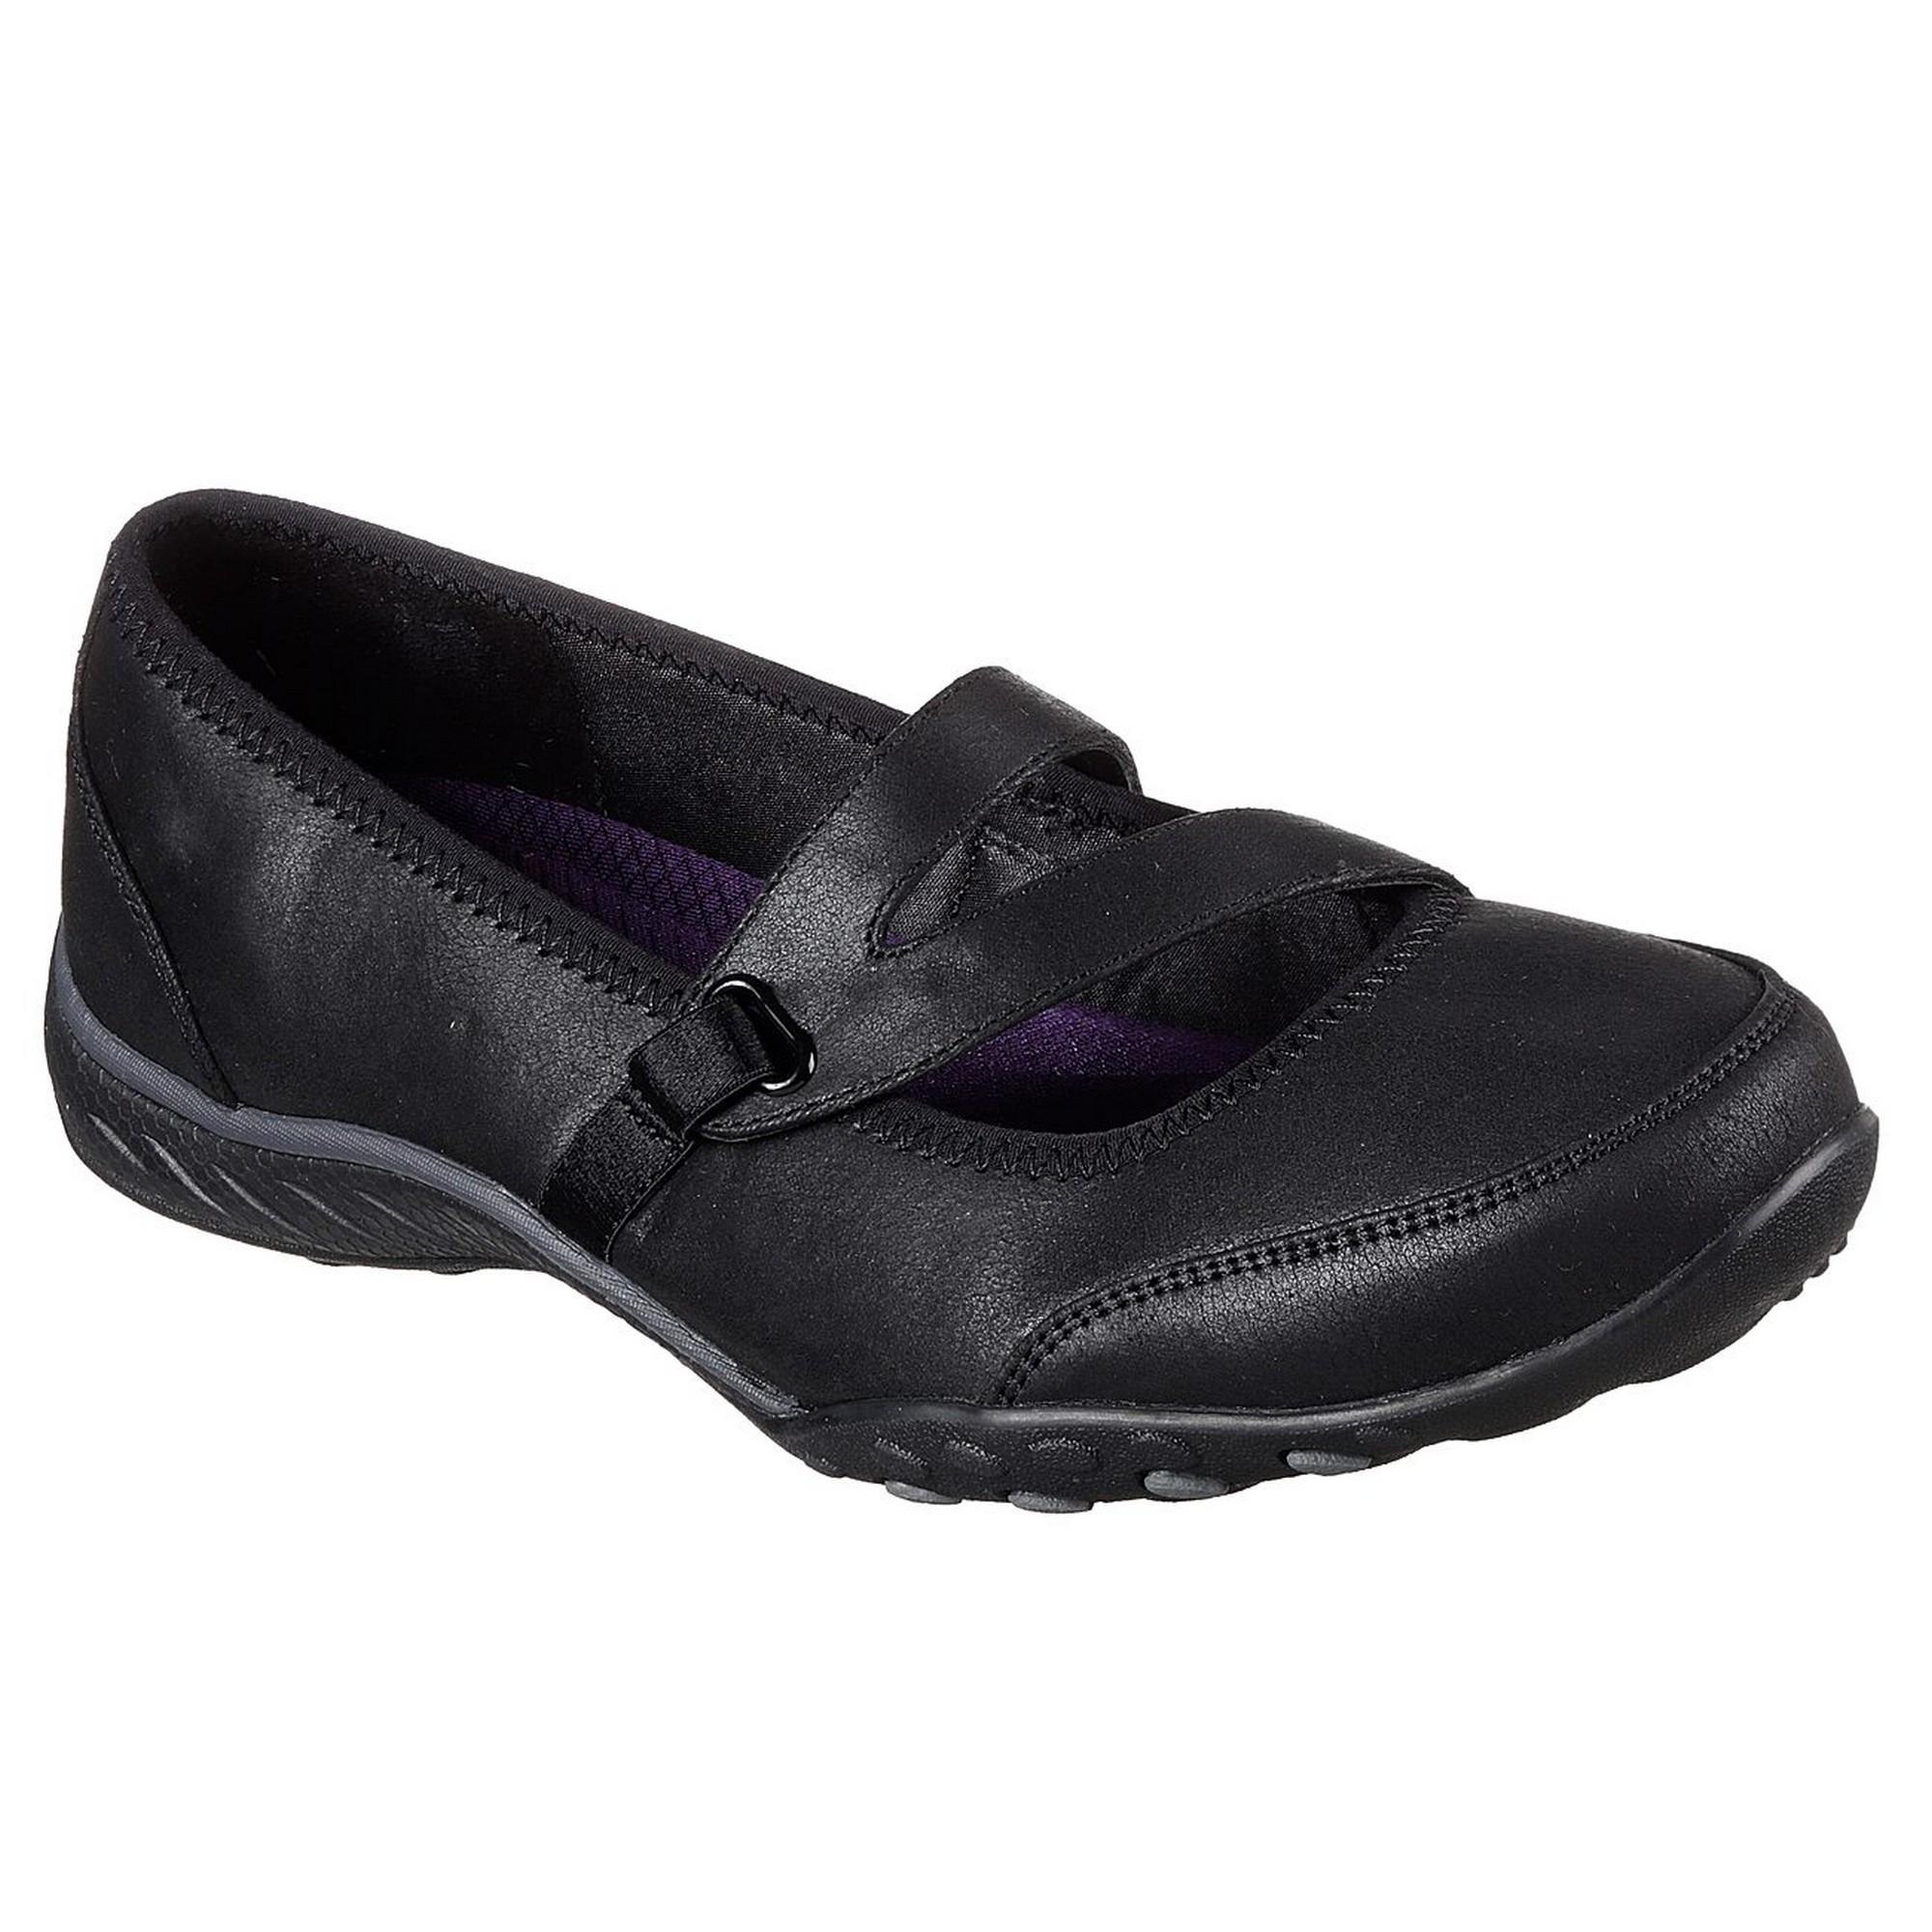 Skechers Womens/Ladies Calmly Breathe Easy Leather Calmly Womens/Ladies Shoes (FS5125) b5515c